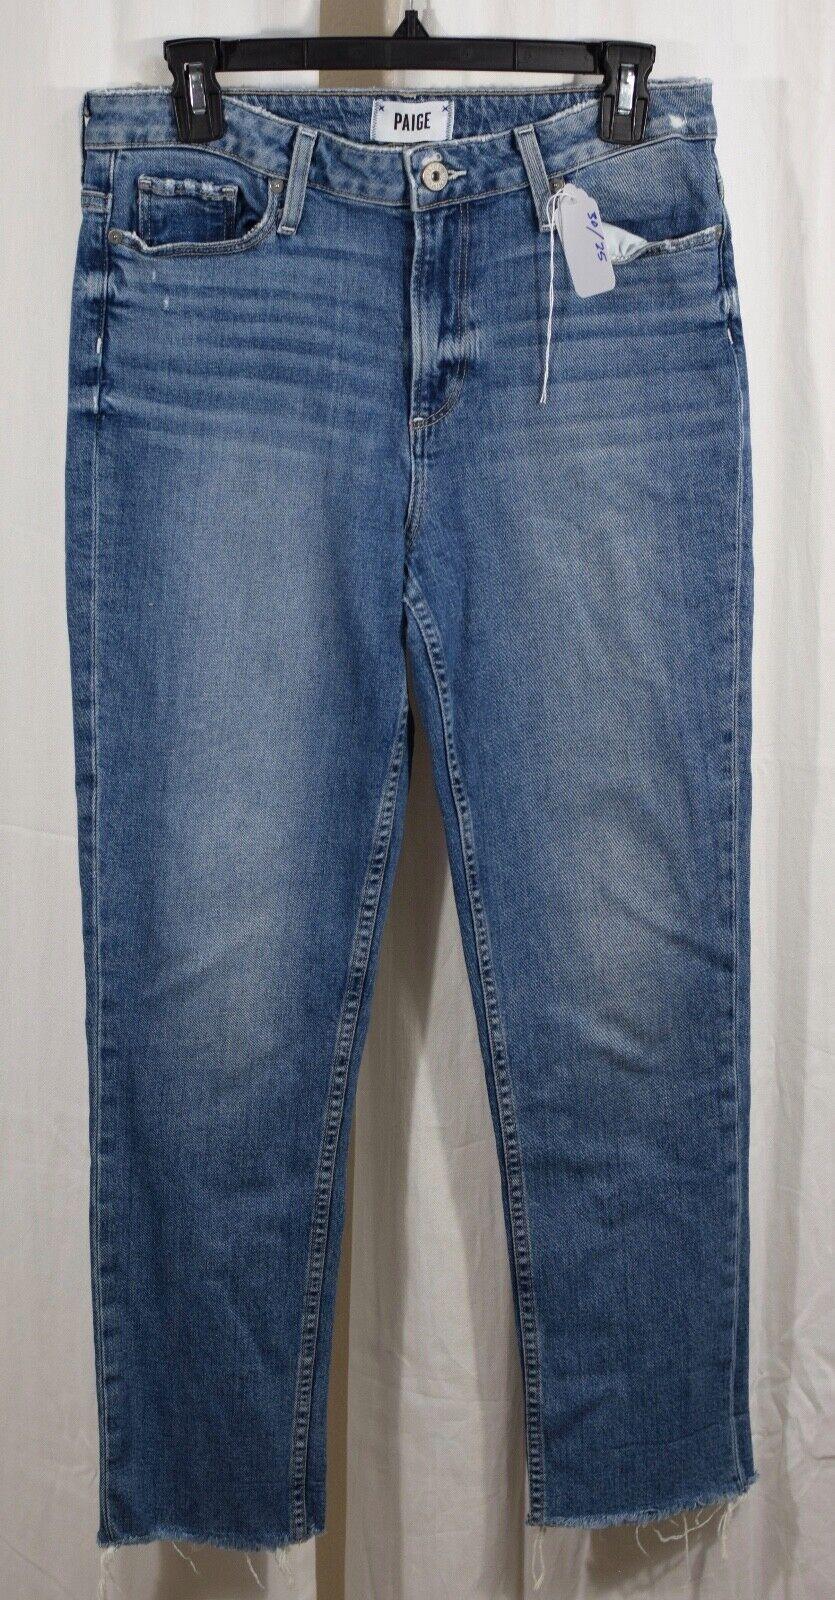 Paige Vintage De Alta Cintura Delgada Raw Dobladillo Hoxton Hoxton Hoxton Jeans Tamaño 30 1ffe84